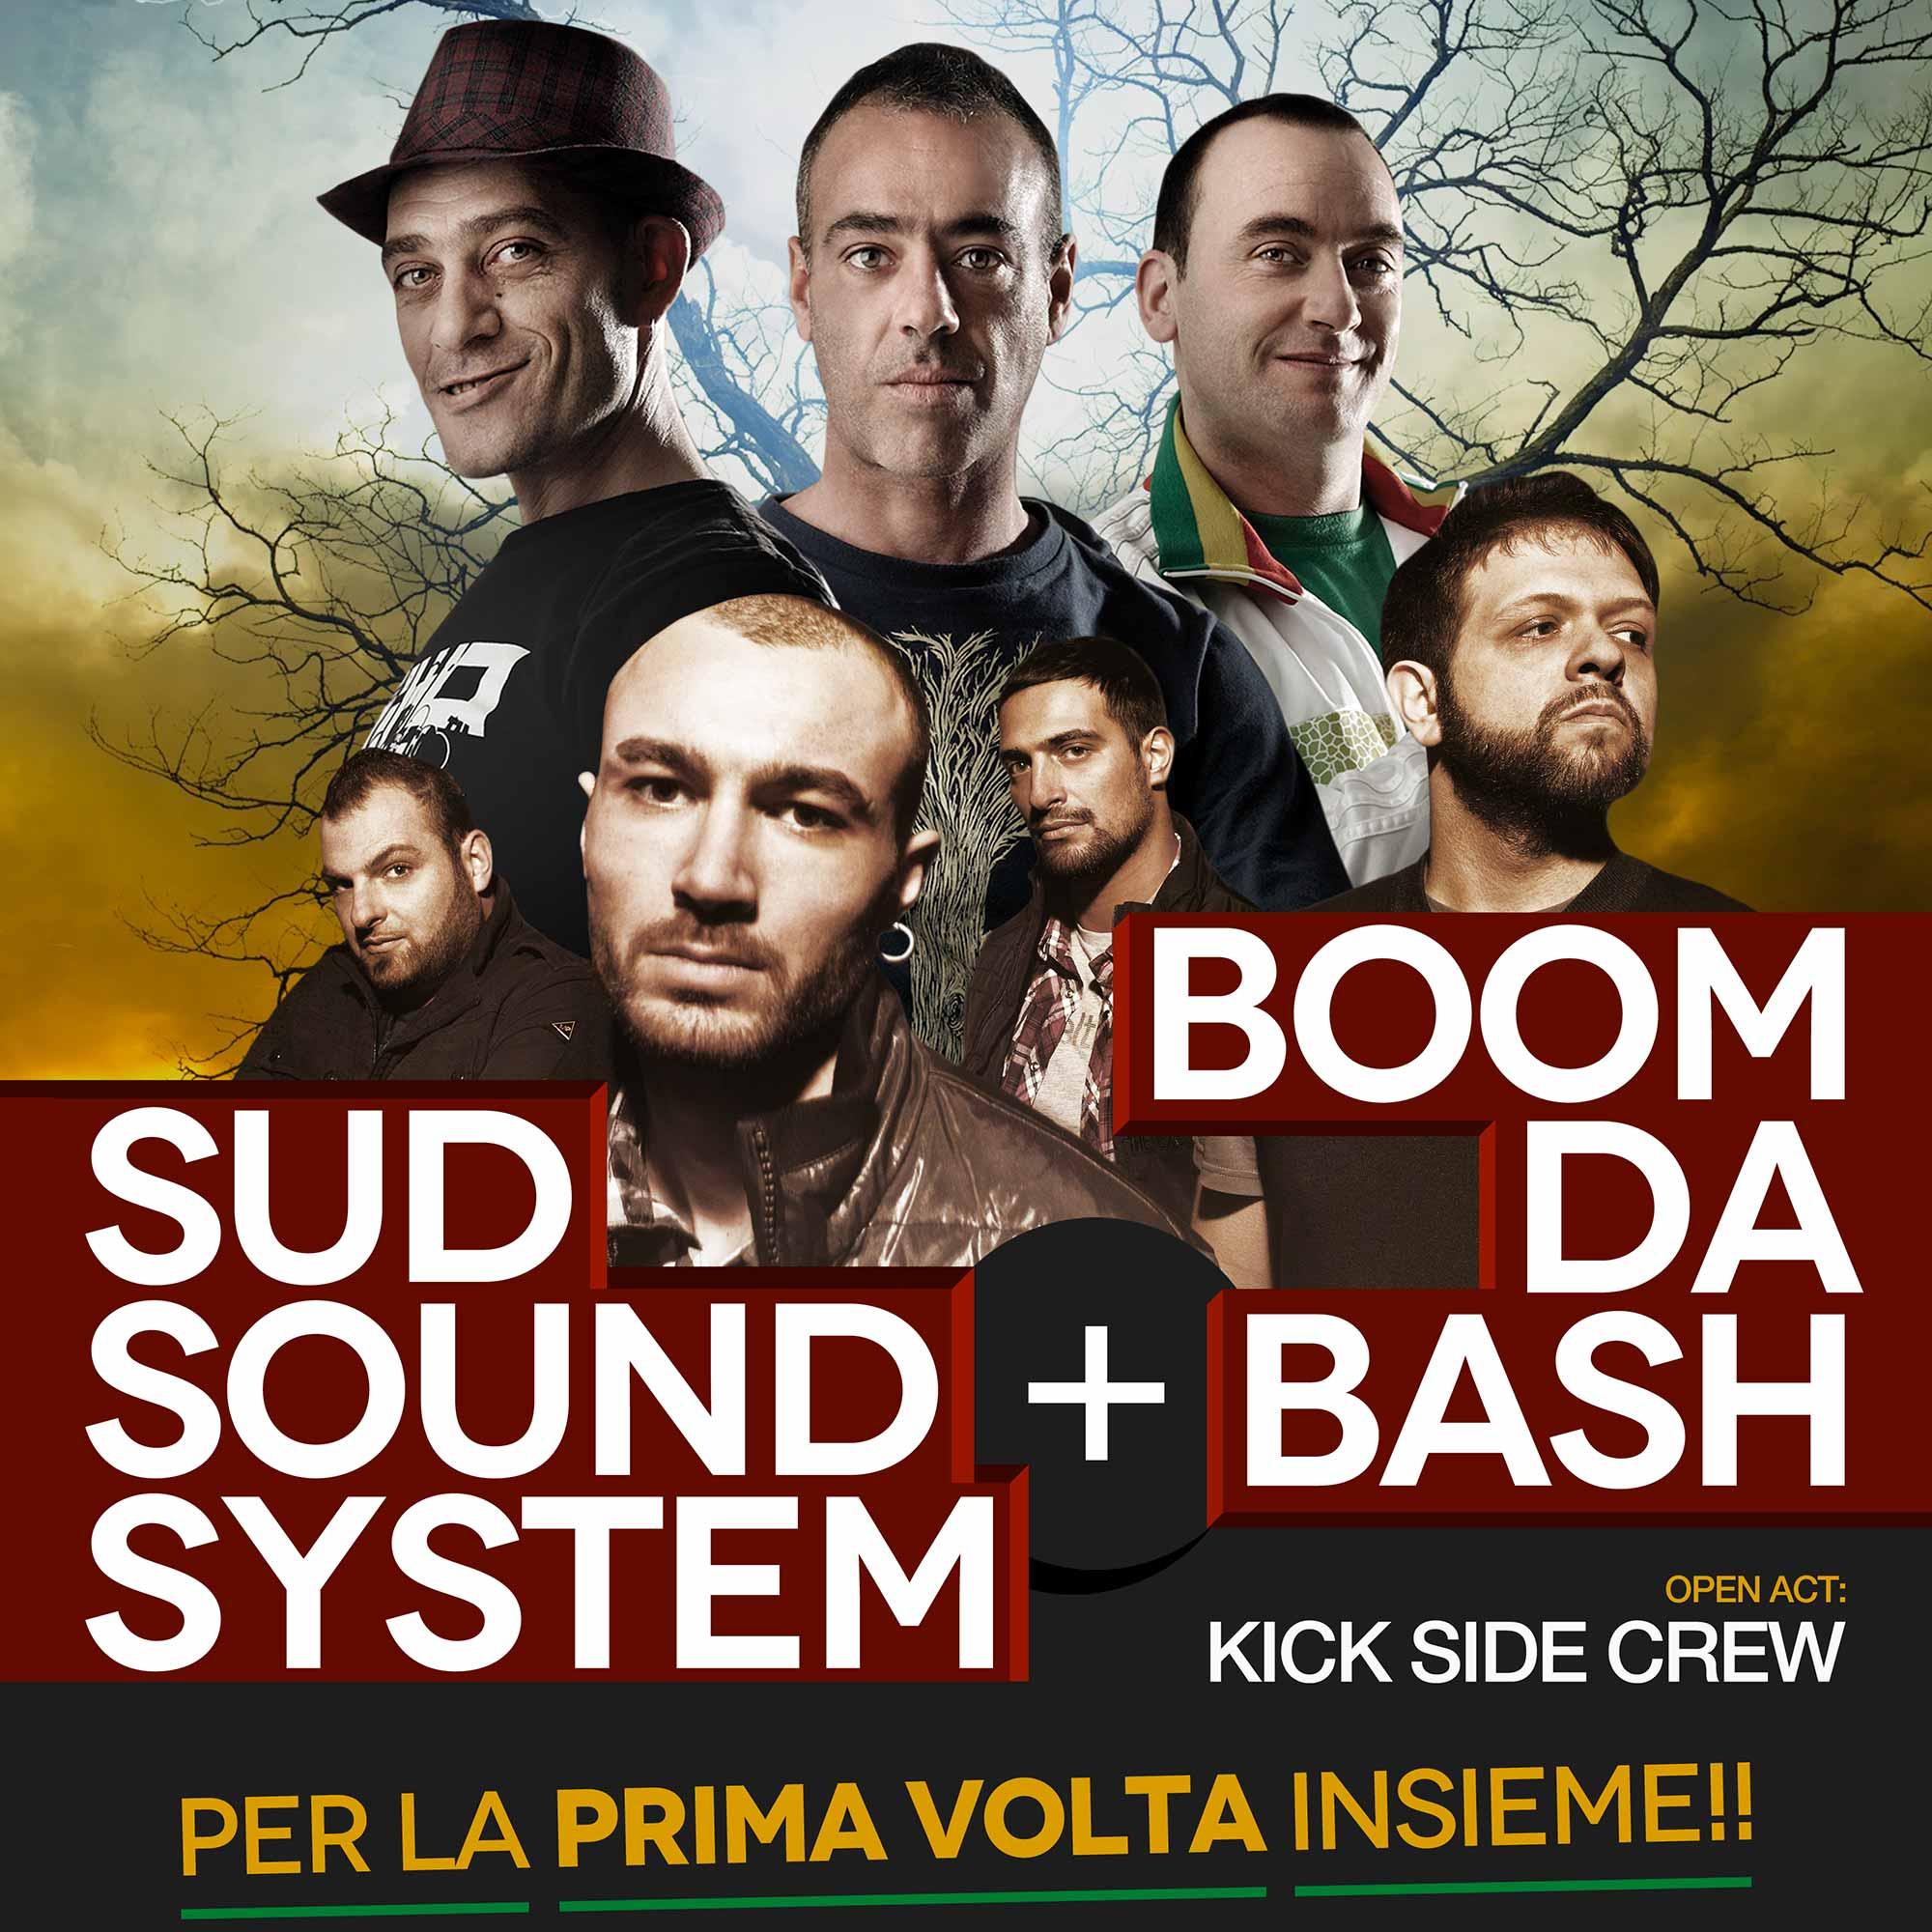 boomdabash sud sound system